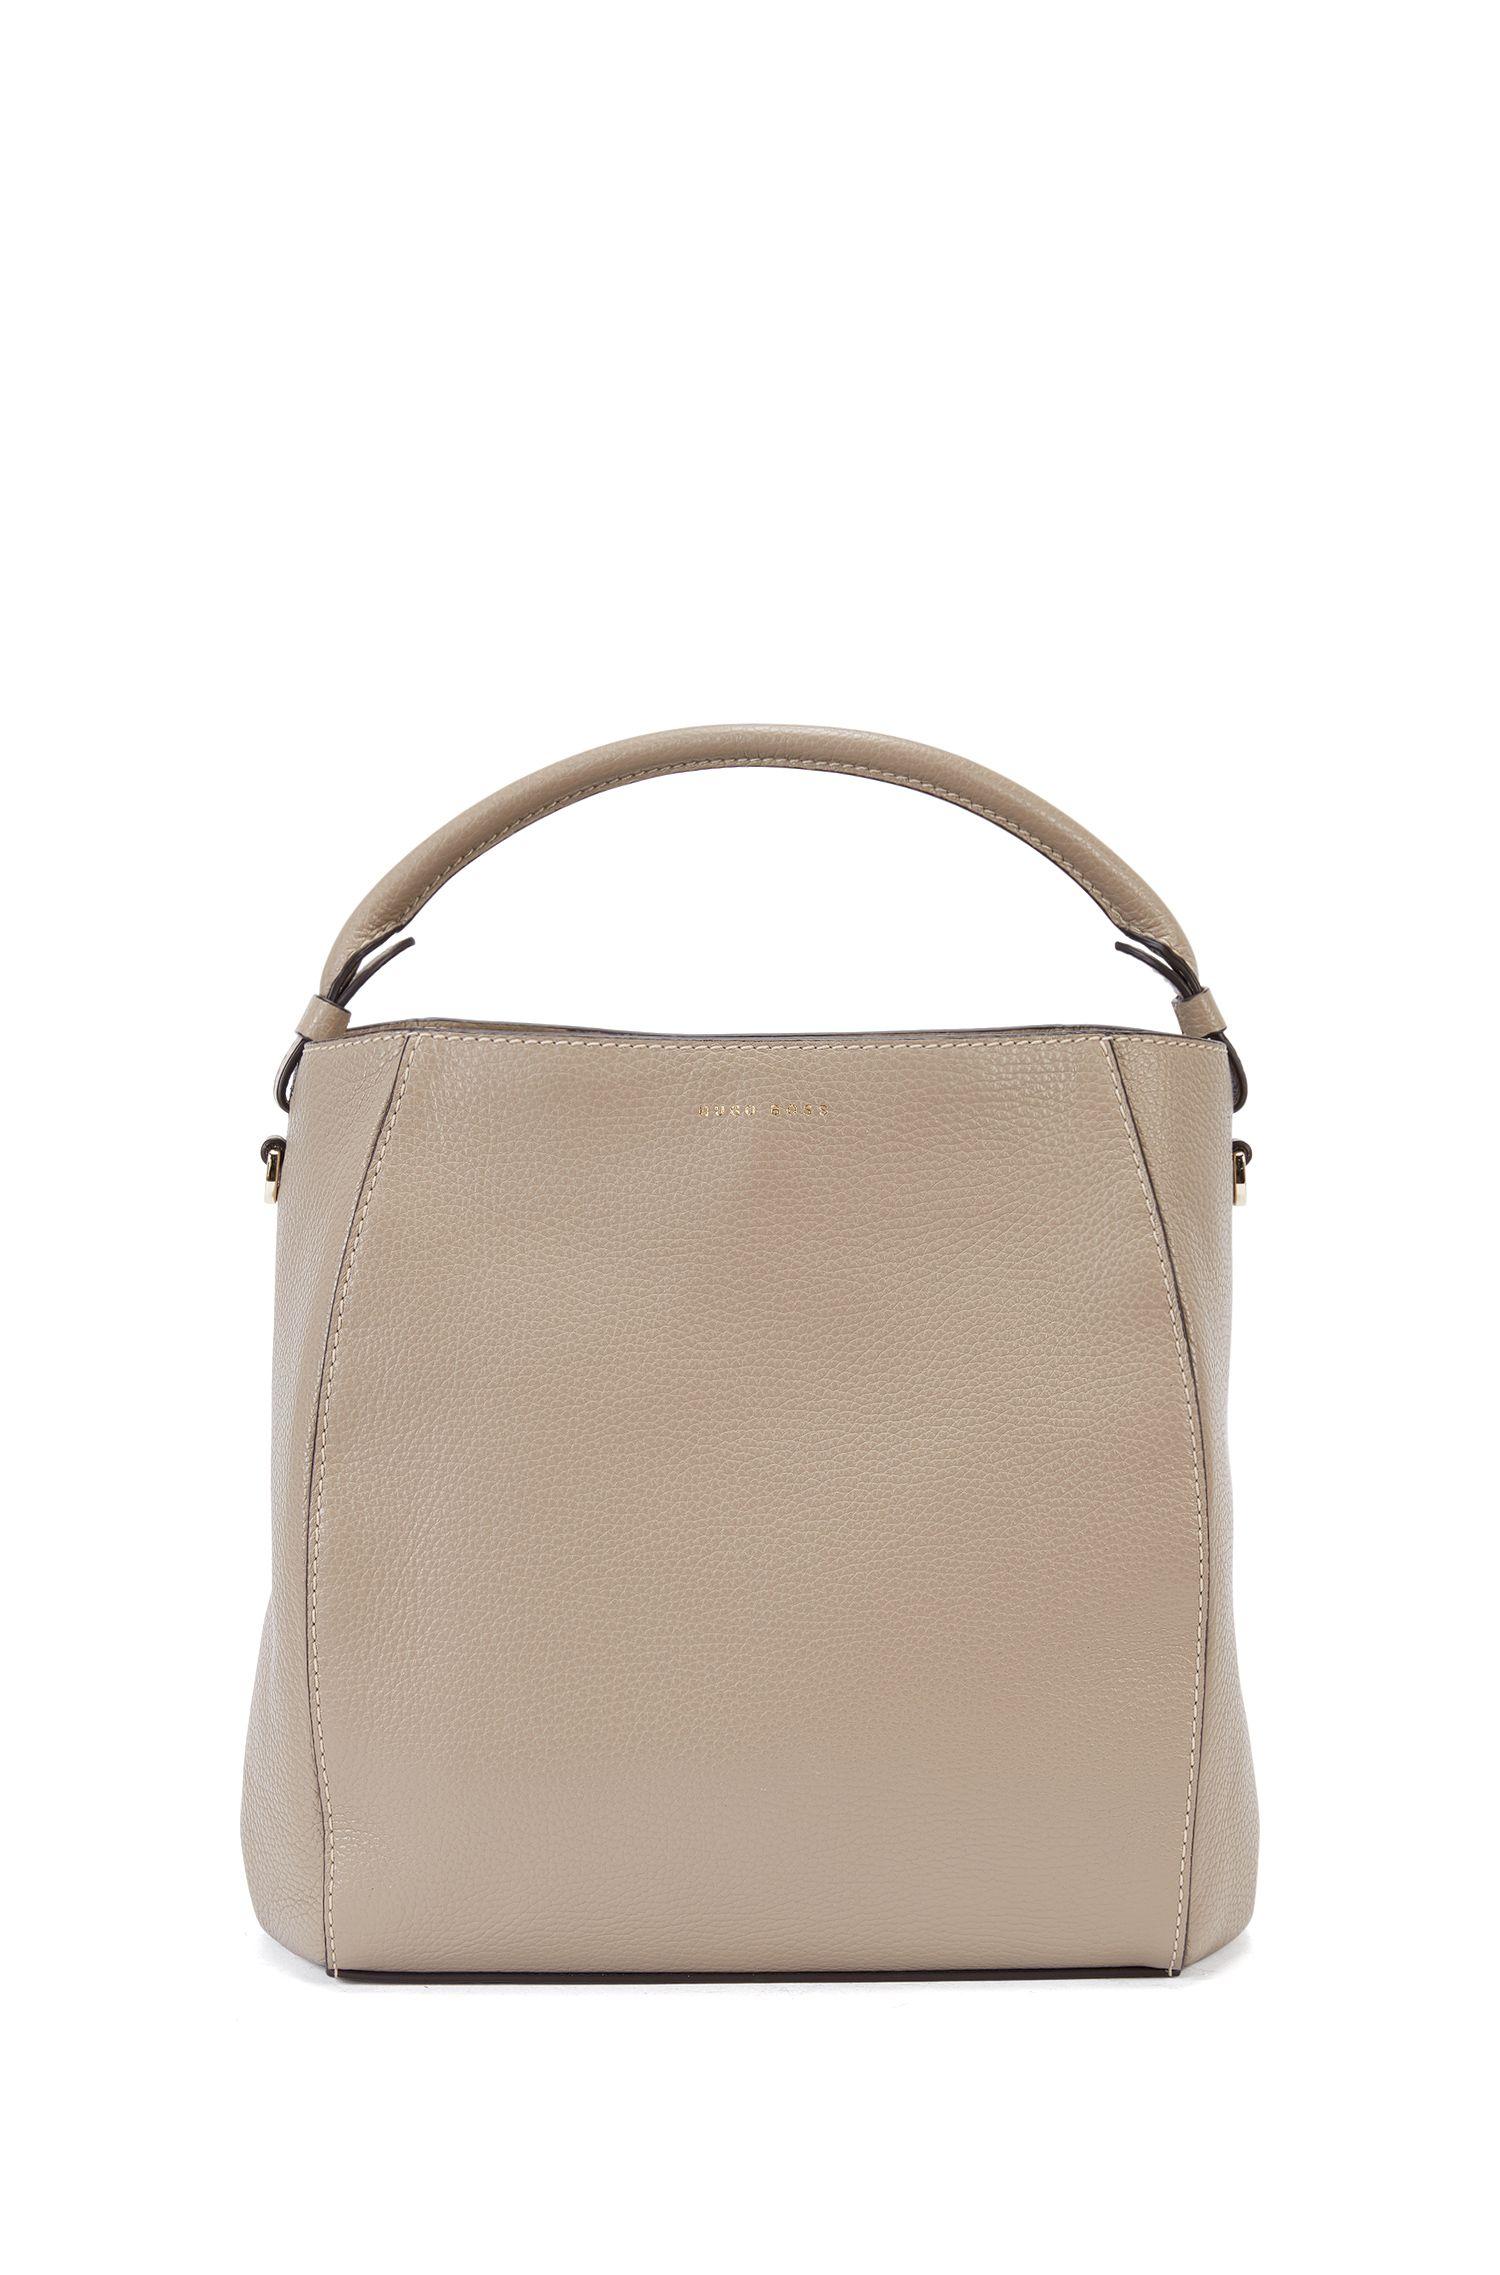 'Soft Drawstring' | Leather Bag